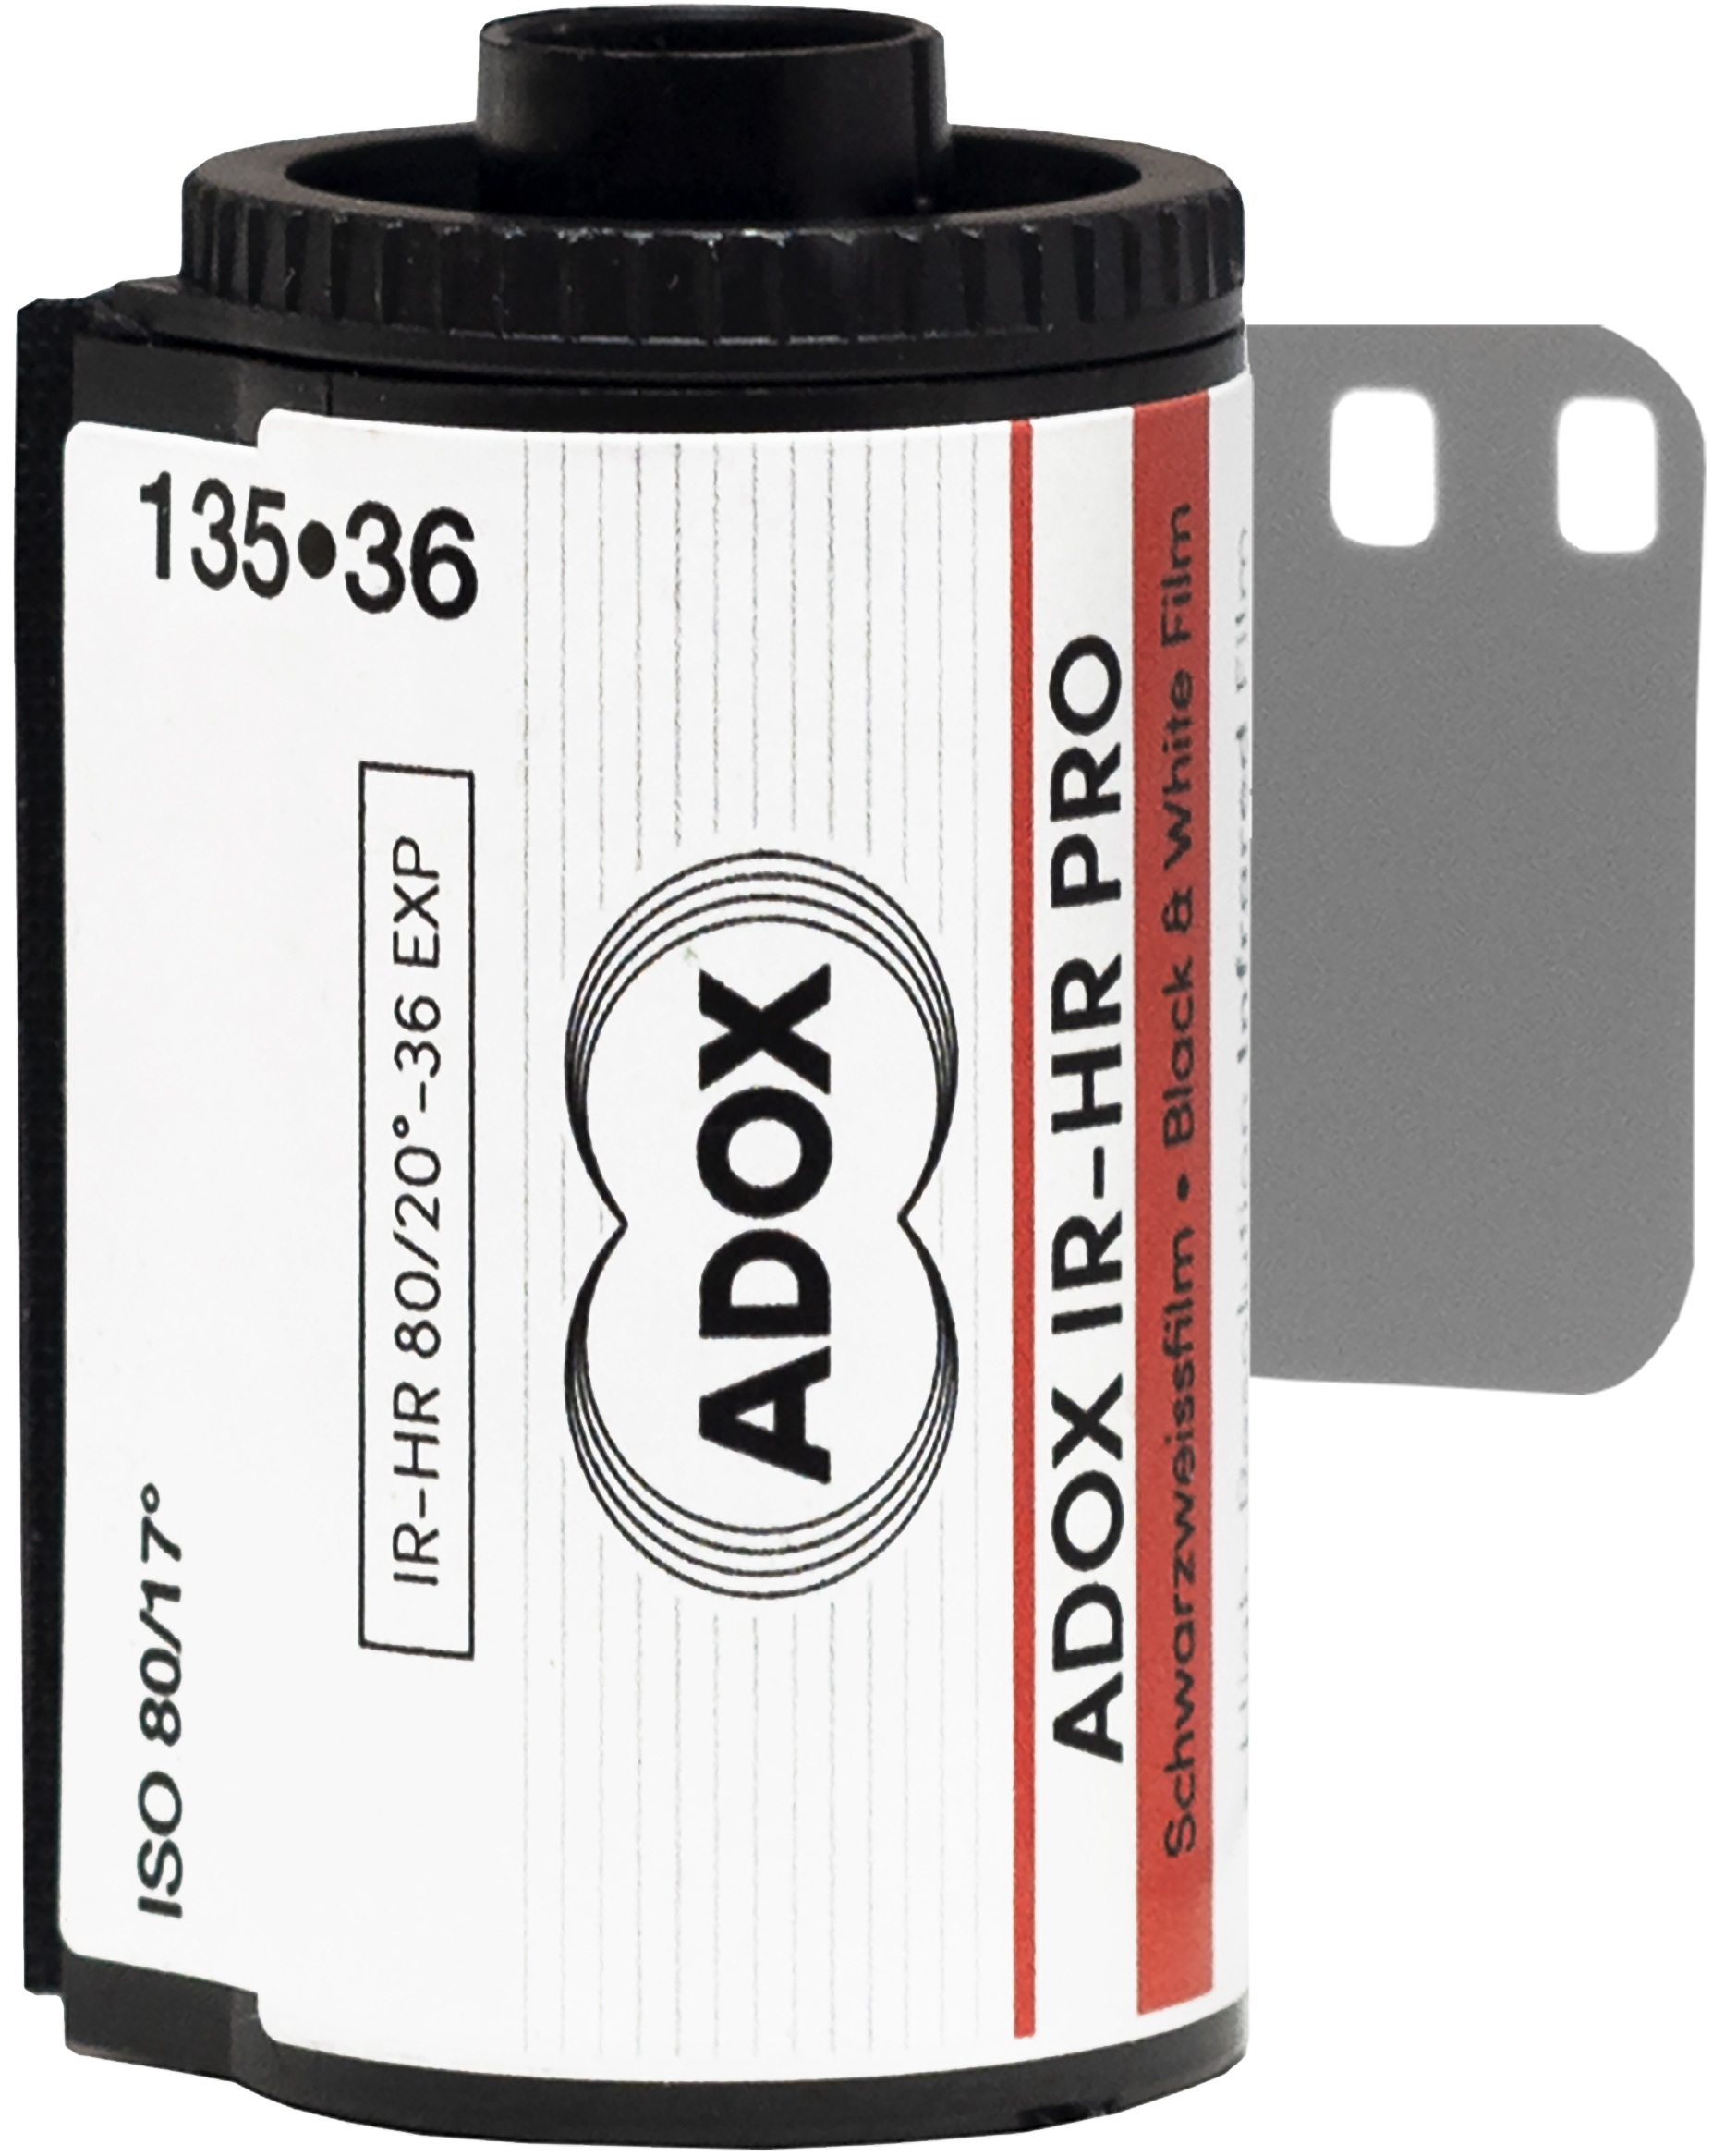 ADOX IR-HR Pro 50/135-36